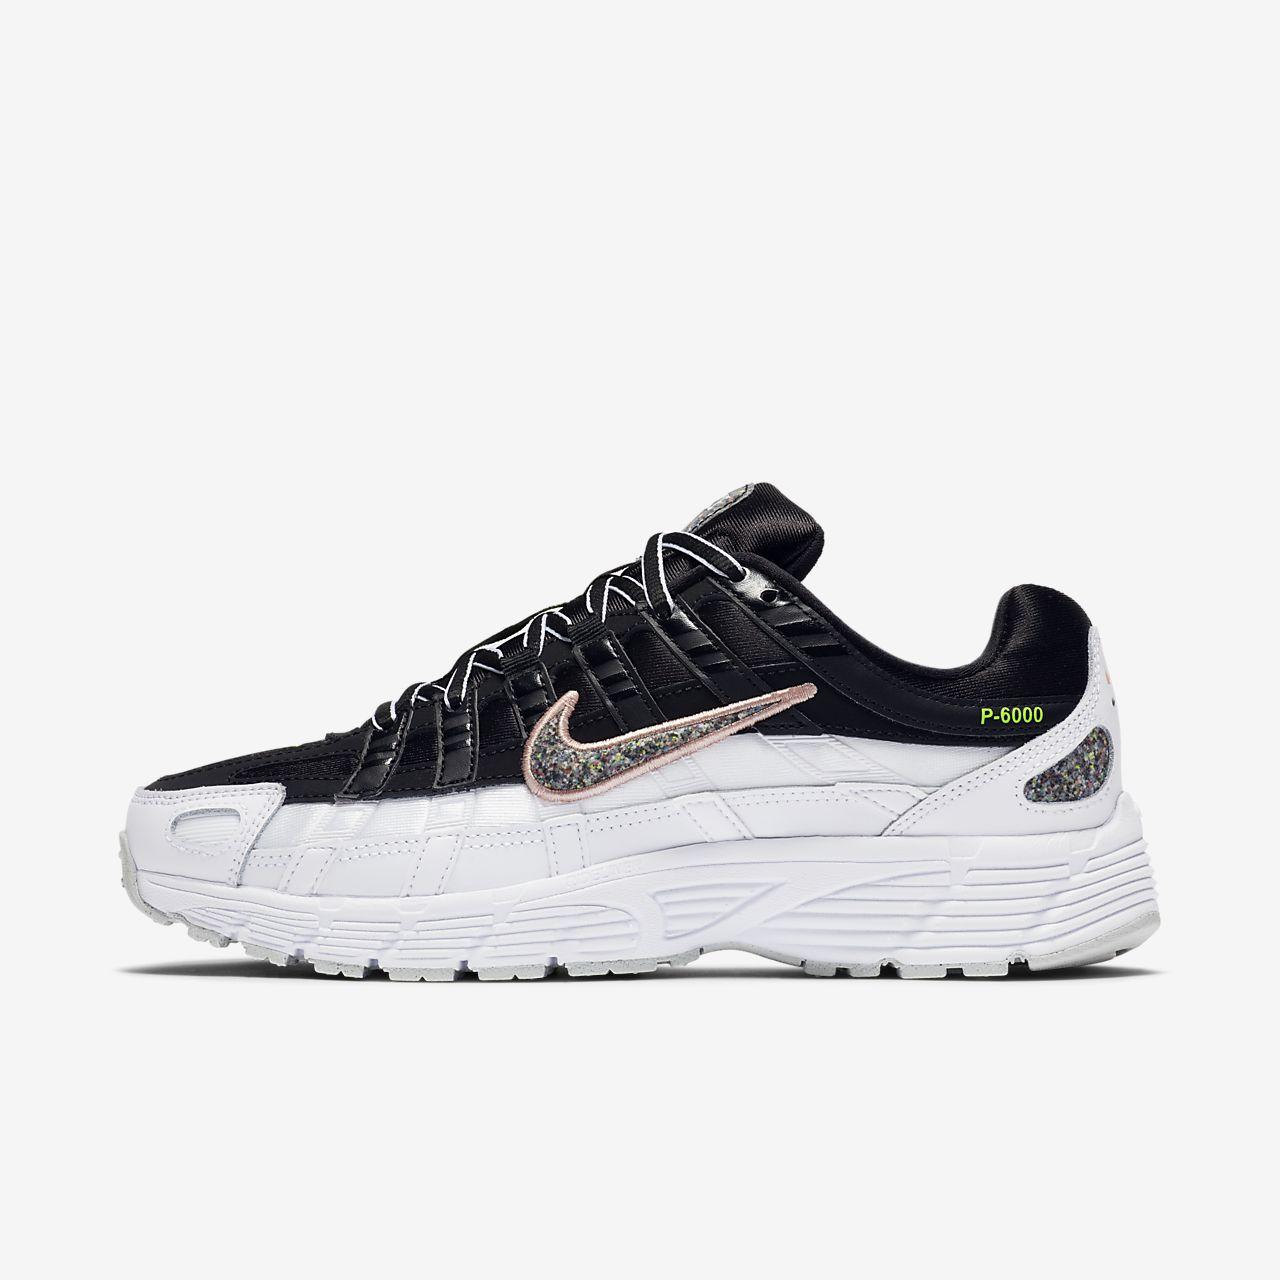 Nike P 6000 SE Damesschoen